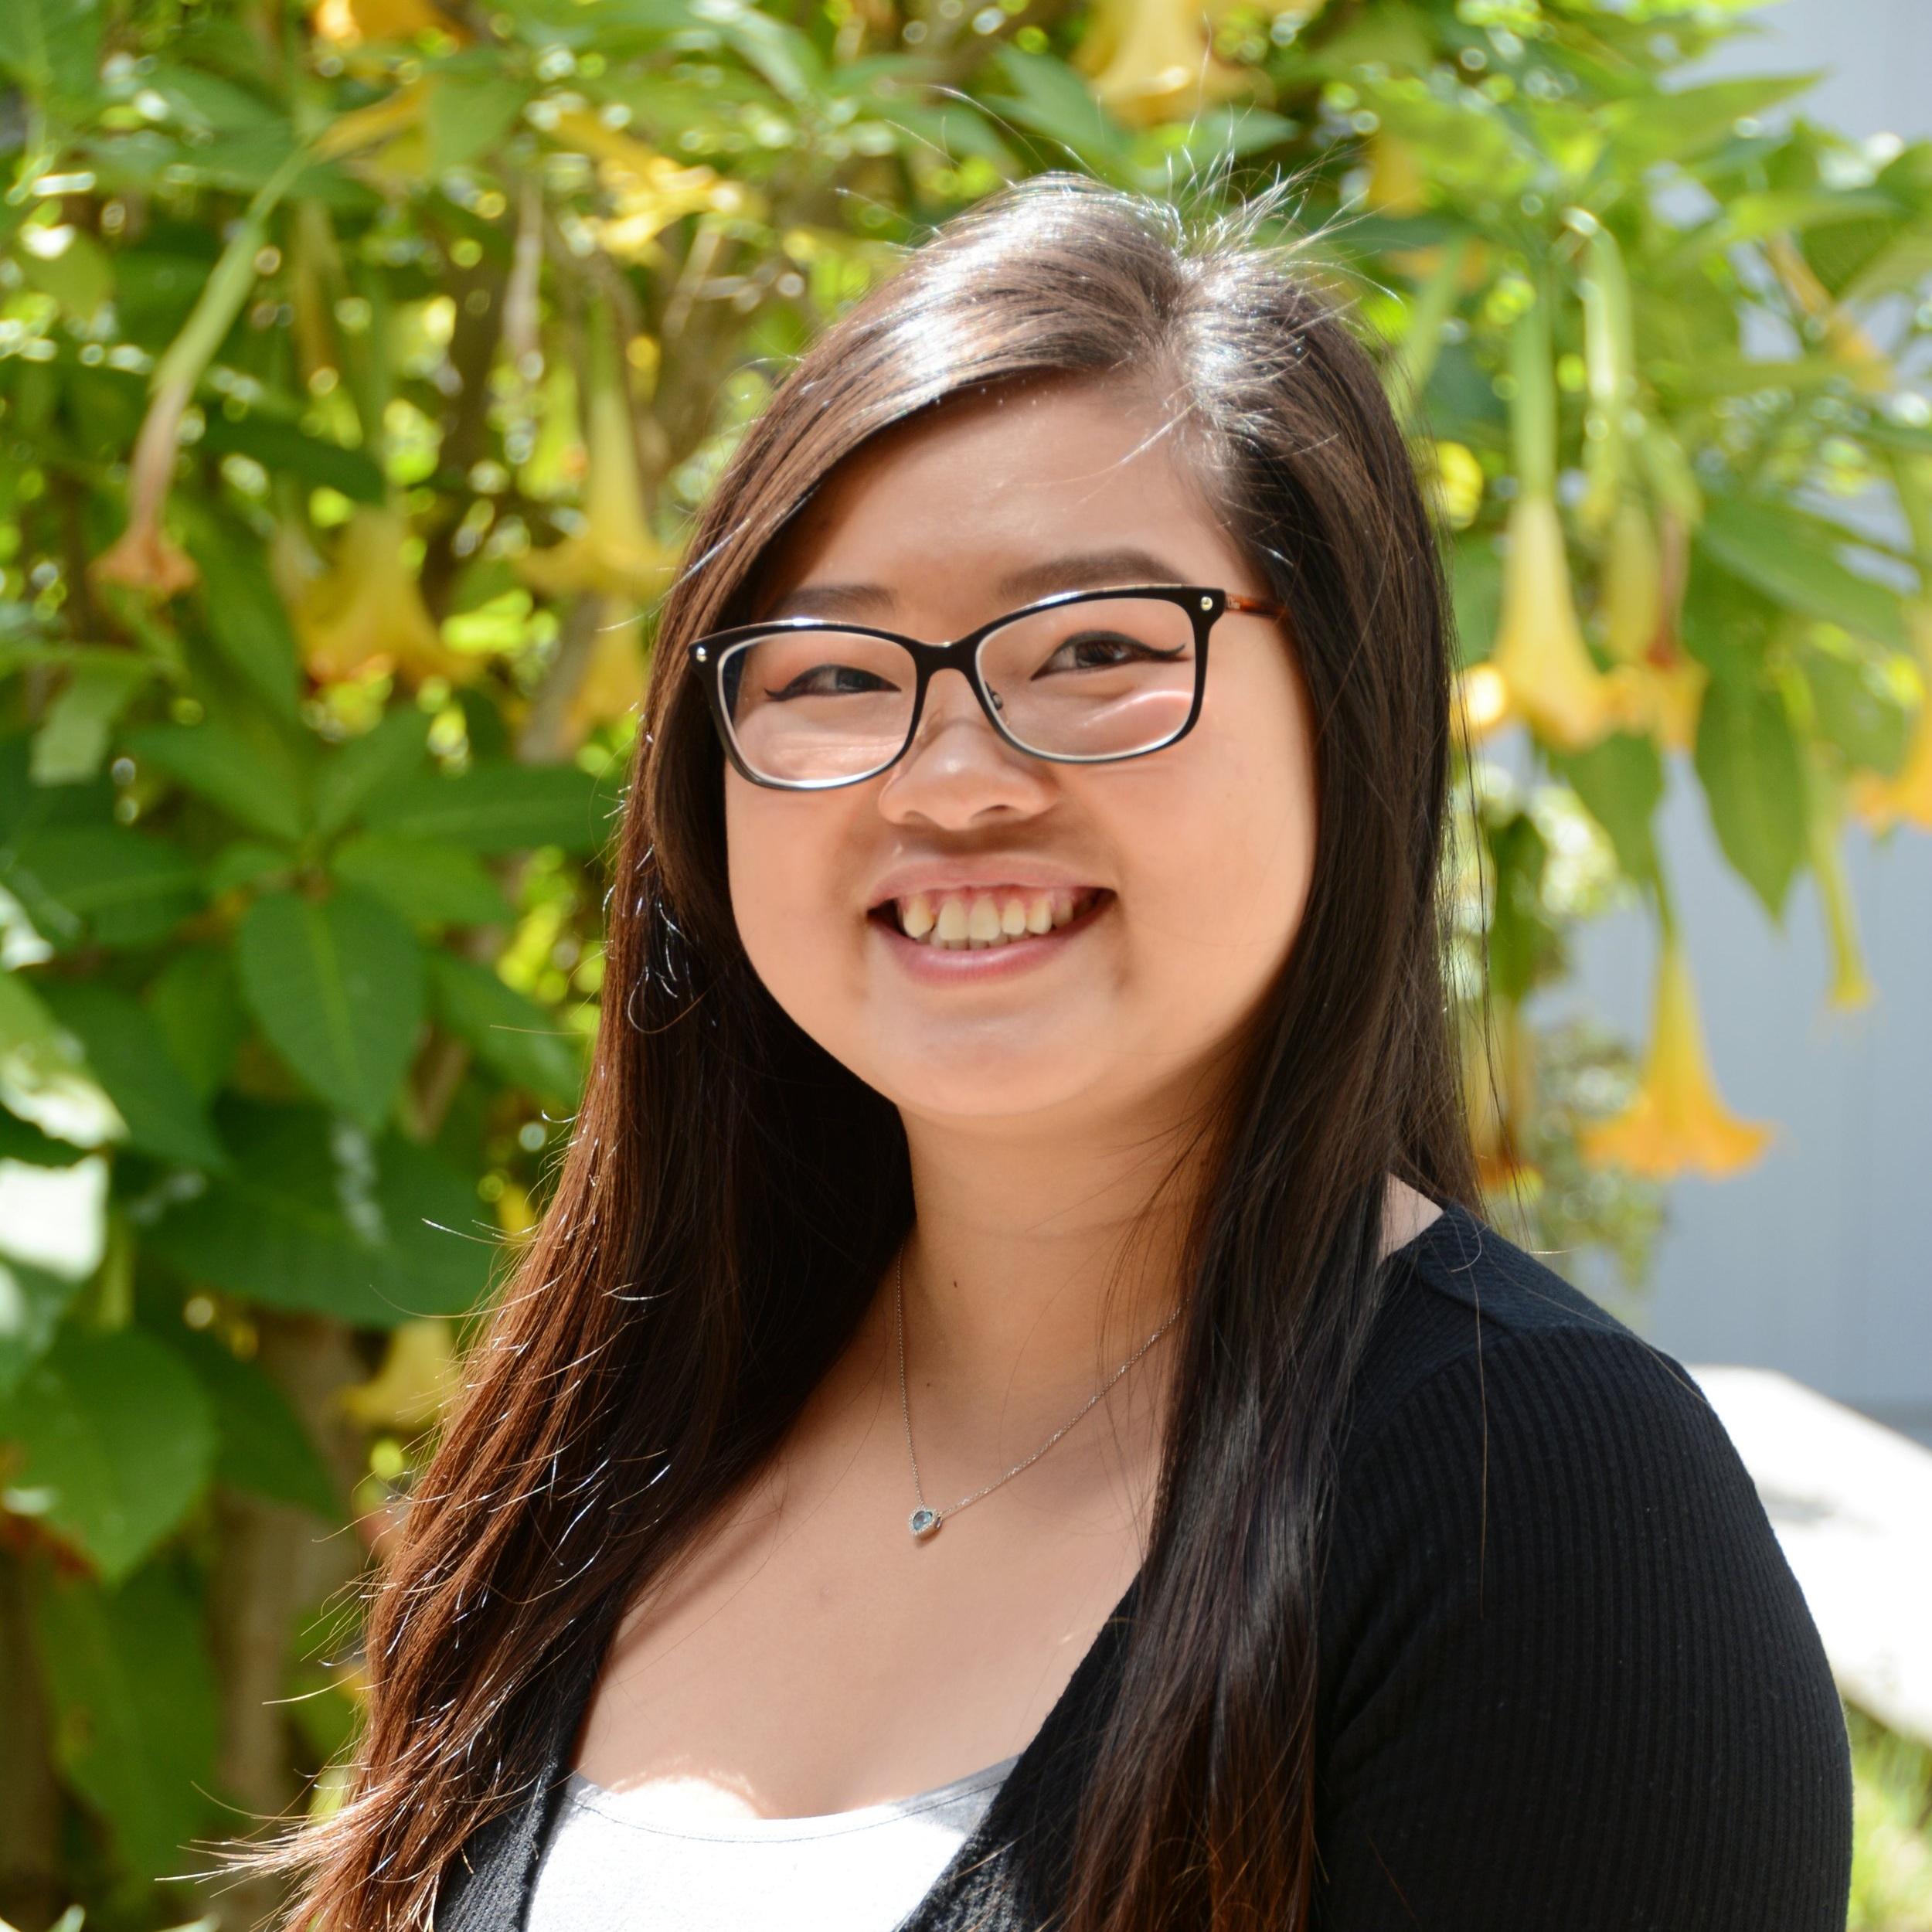 Vivian Lee - Social Media and Event Specialist Intern